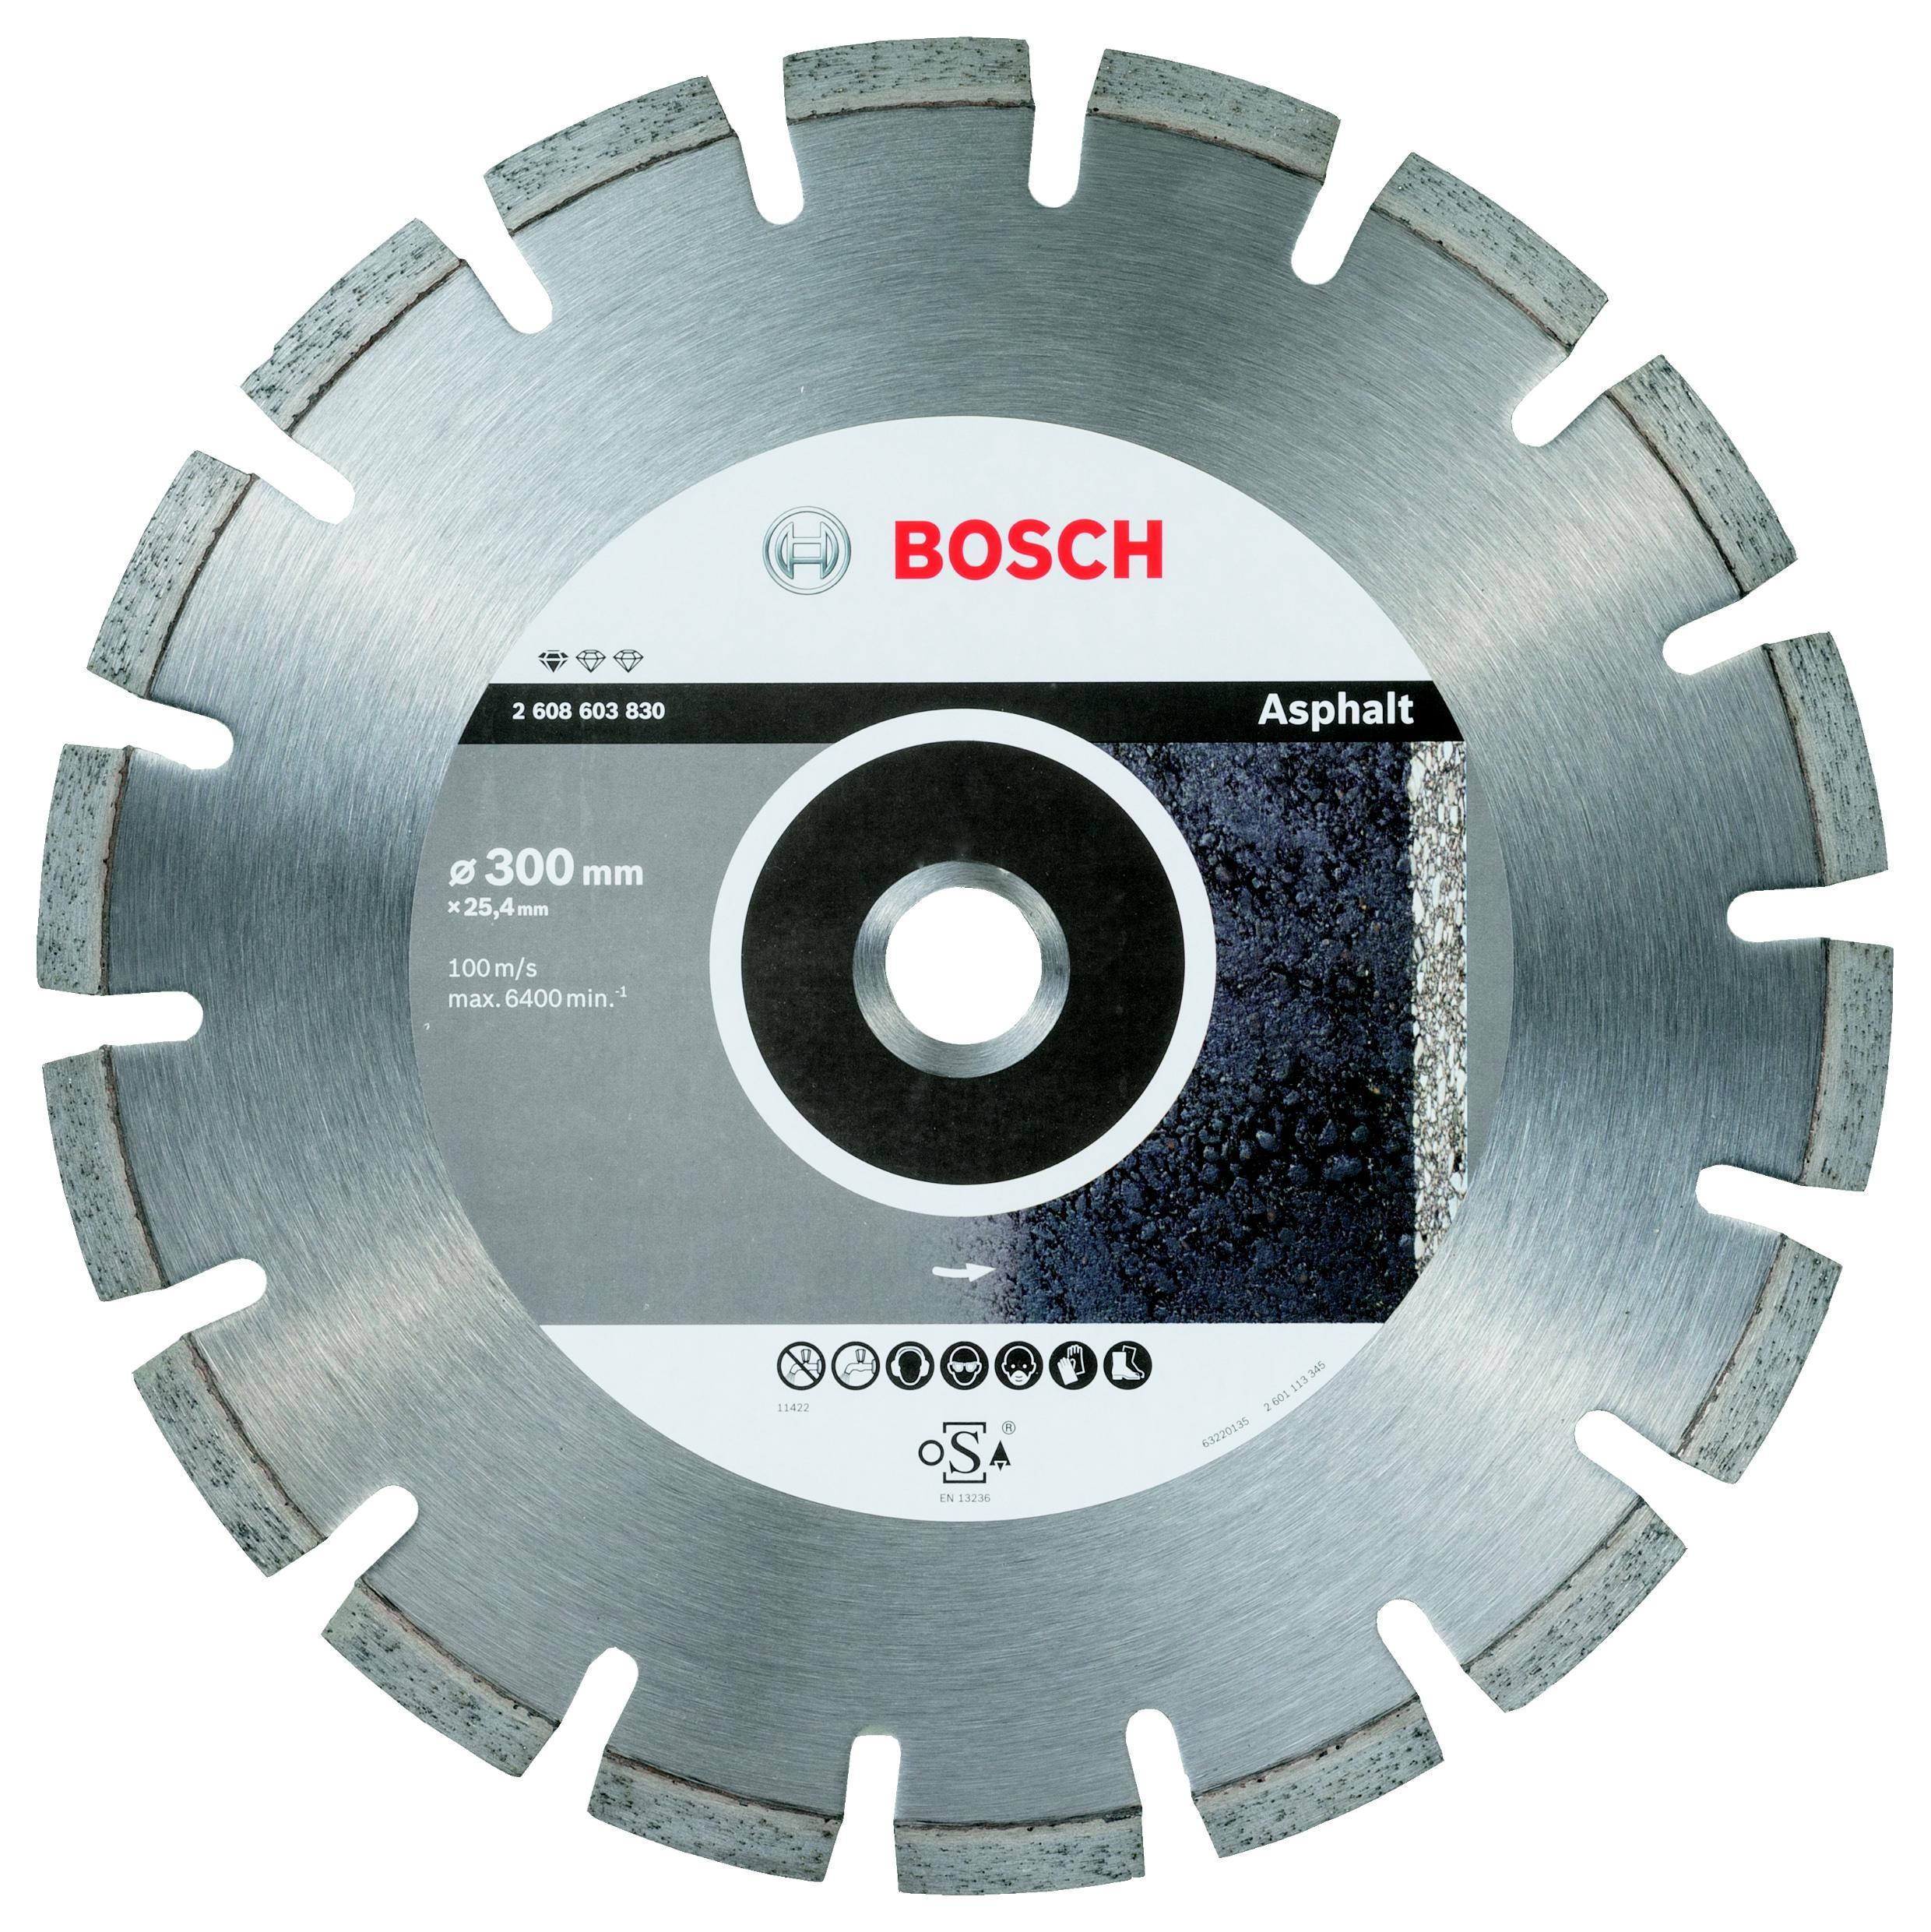 Круг алмазный Bosch Ф300х25.4мм по асфальту (2608603830 standard for asphalt) зубило по асфальту bosch 2608690003 по асфальту sds max 90x400мм